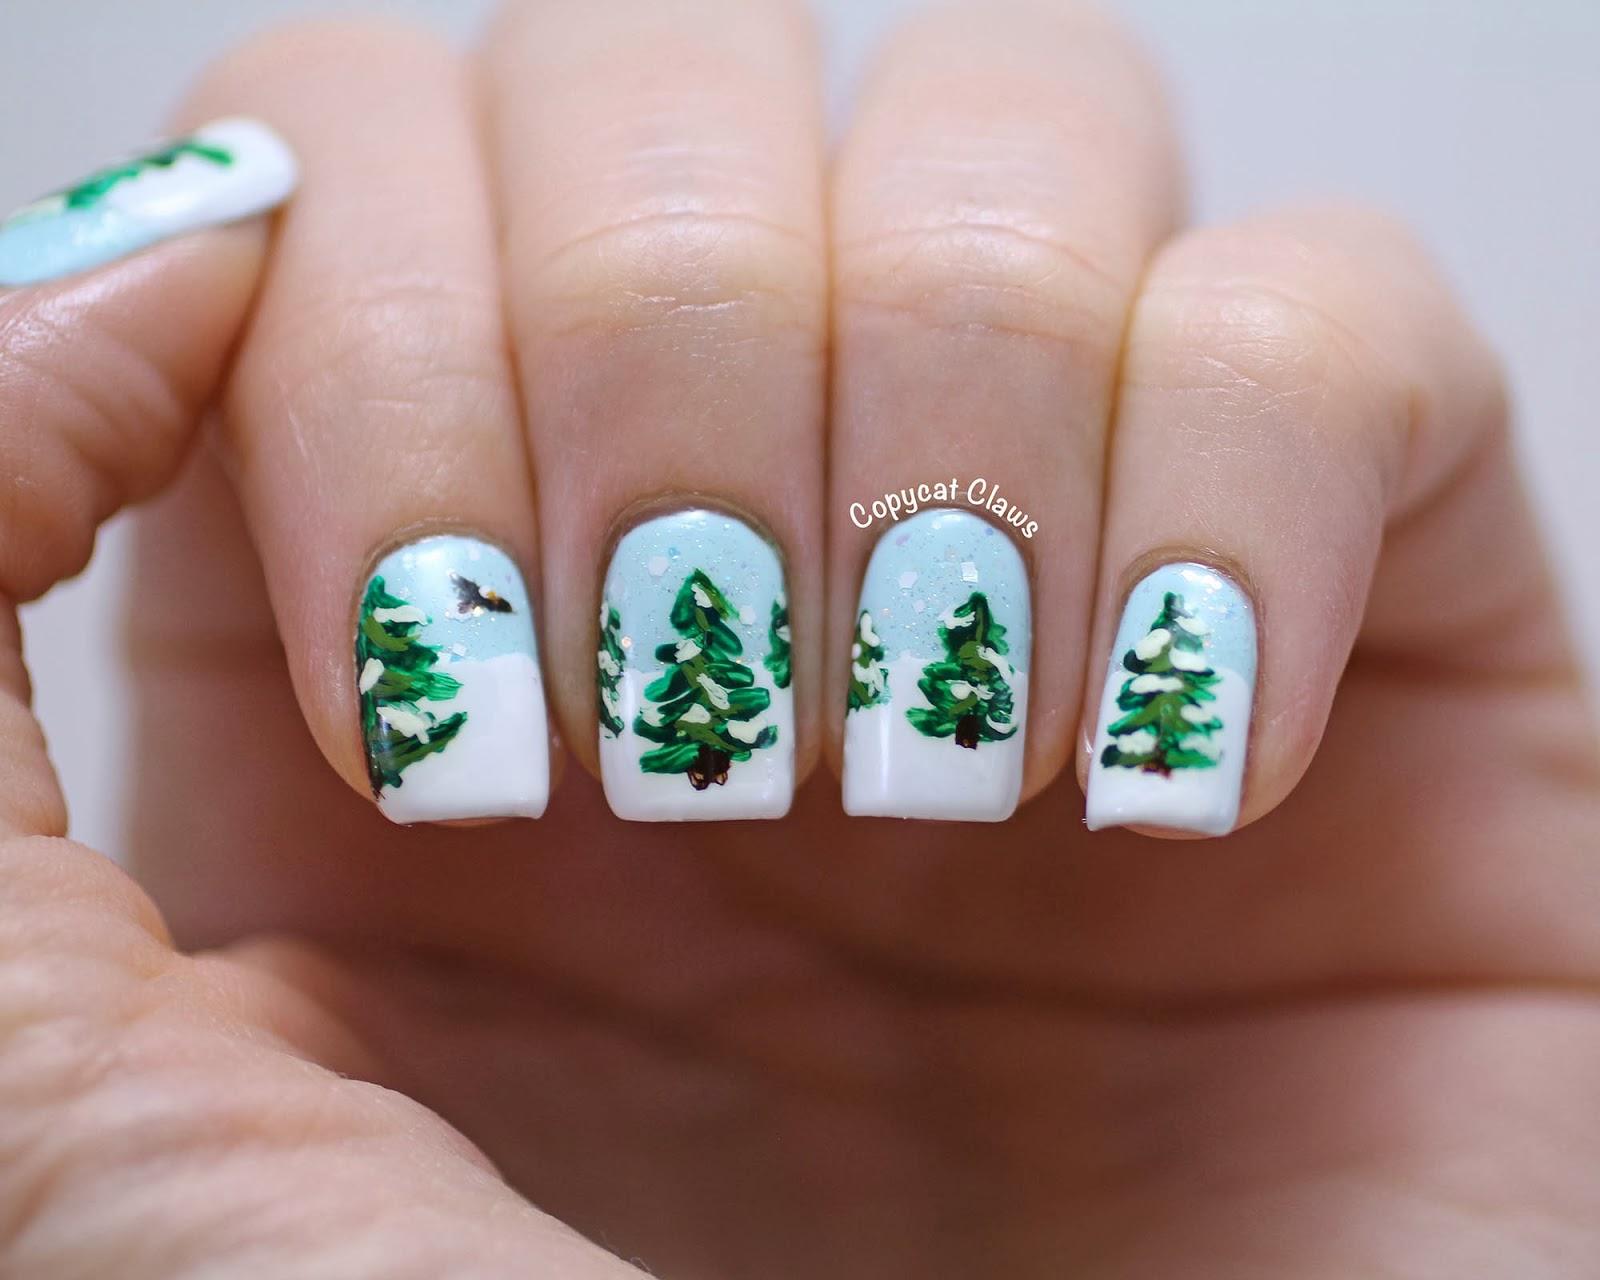 Copycat Claws: Winter Wonderland Nail Art